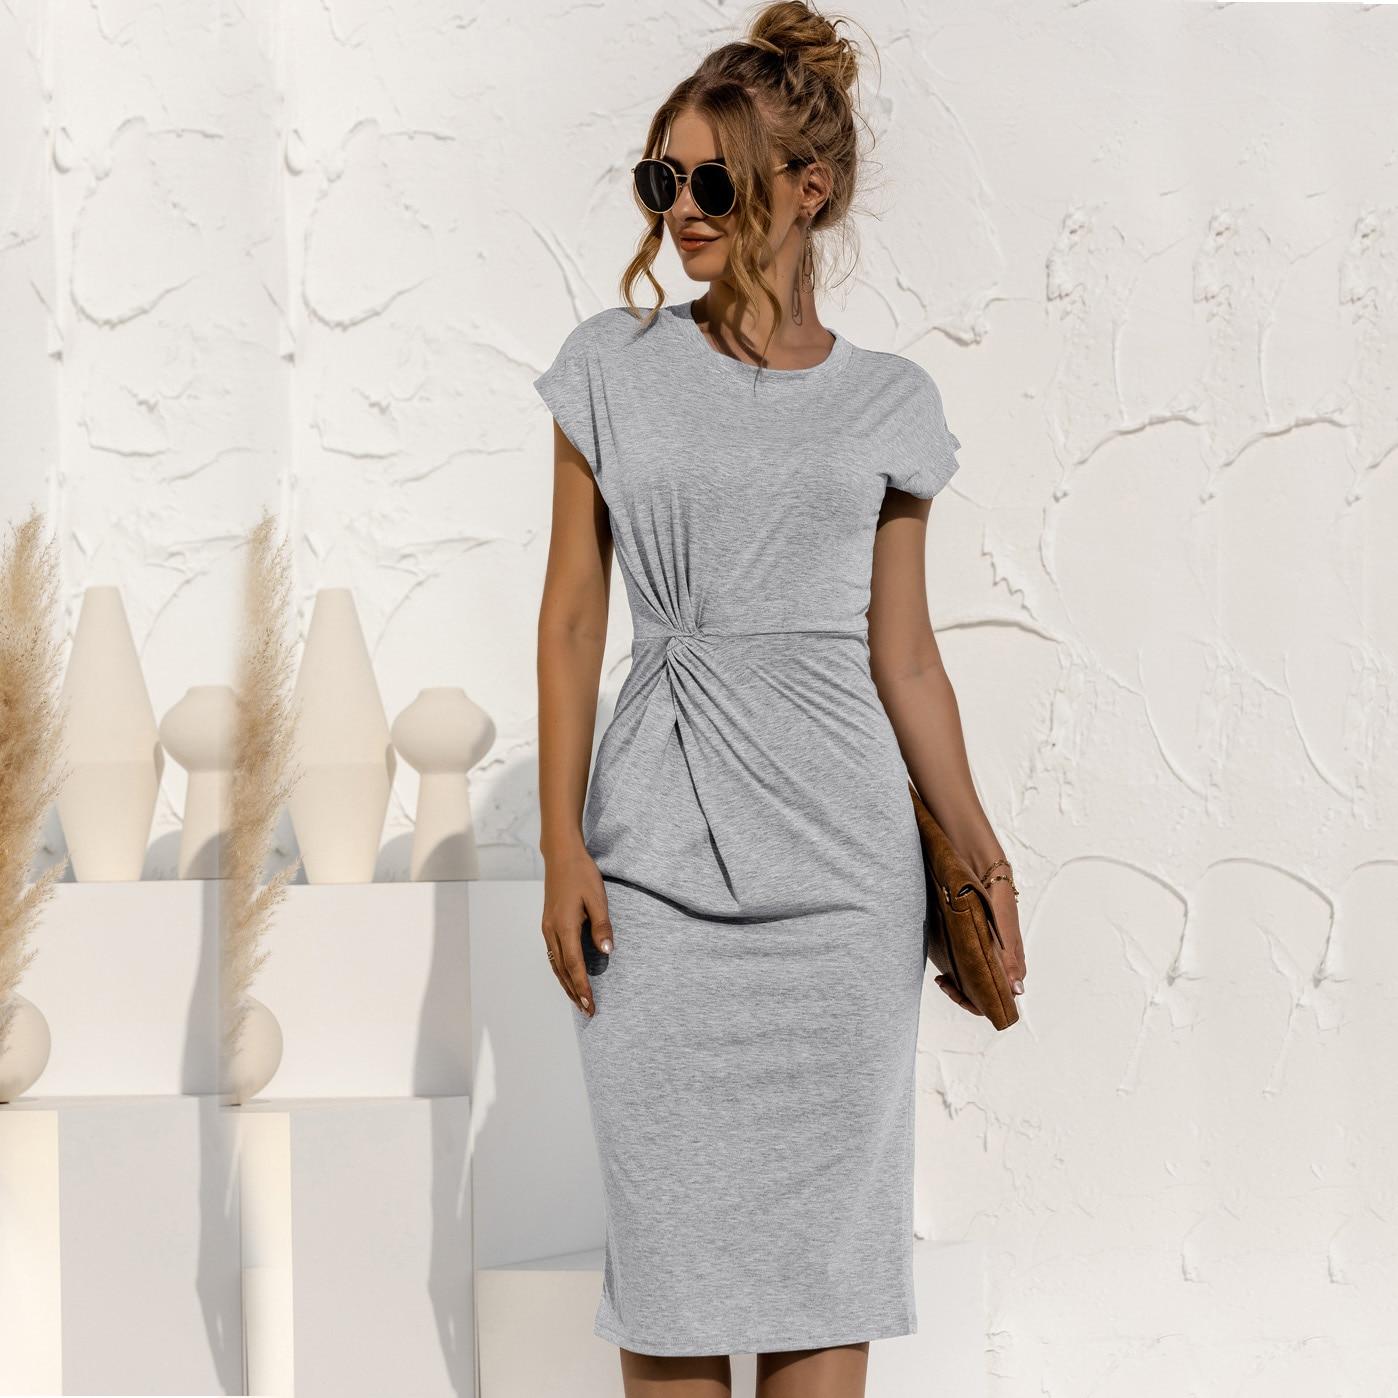 women knitted slim dress 202 summer Trumpet O-Neck short sleeve Empire Waist Slim Solid Straps Mid-calf knitted Dress 10